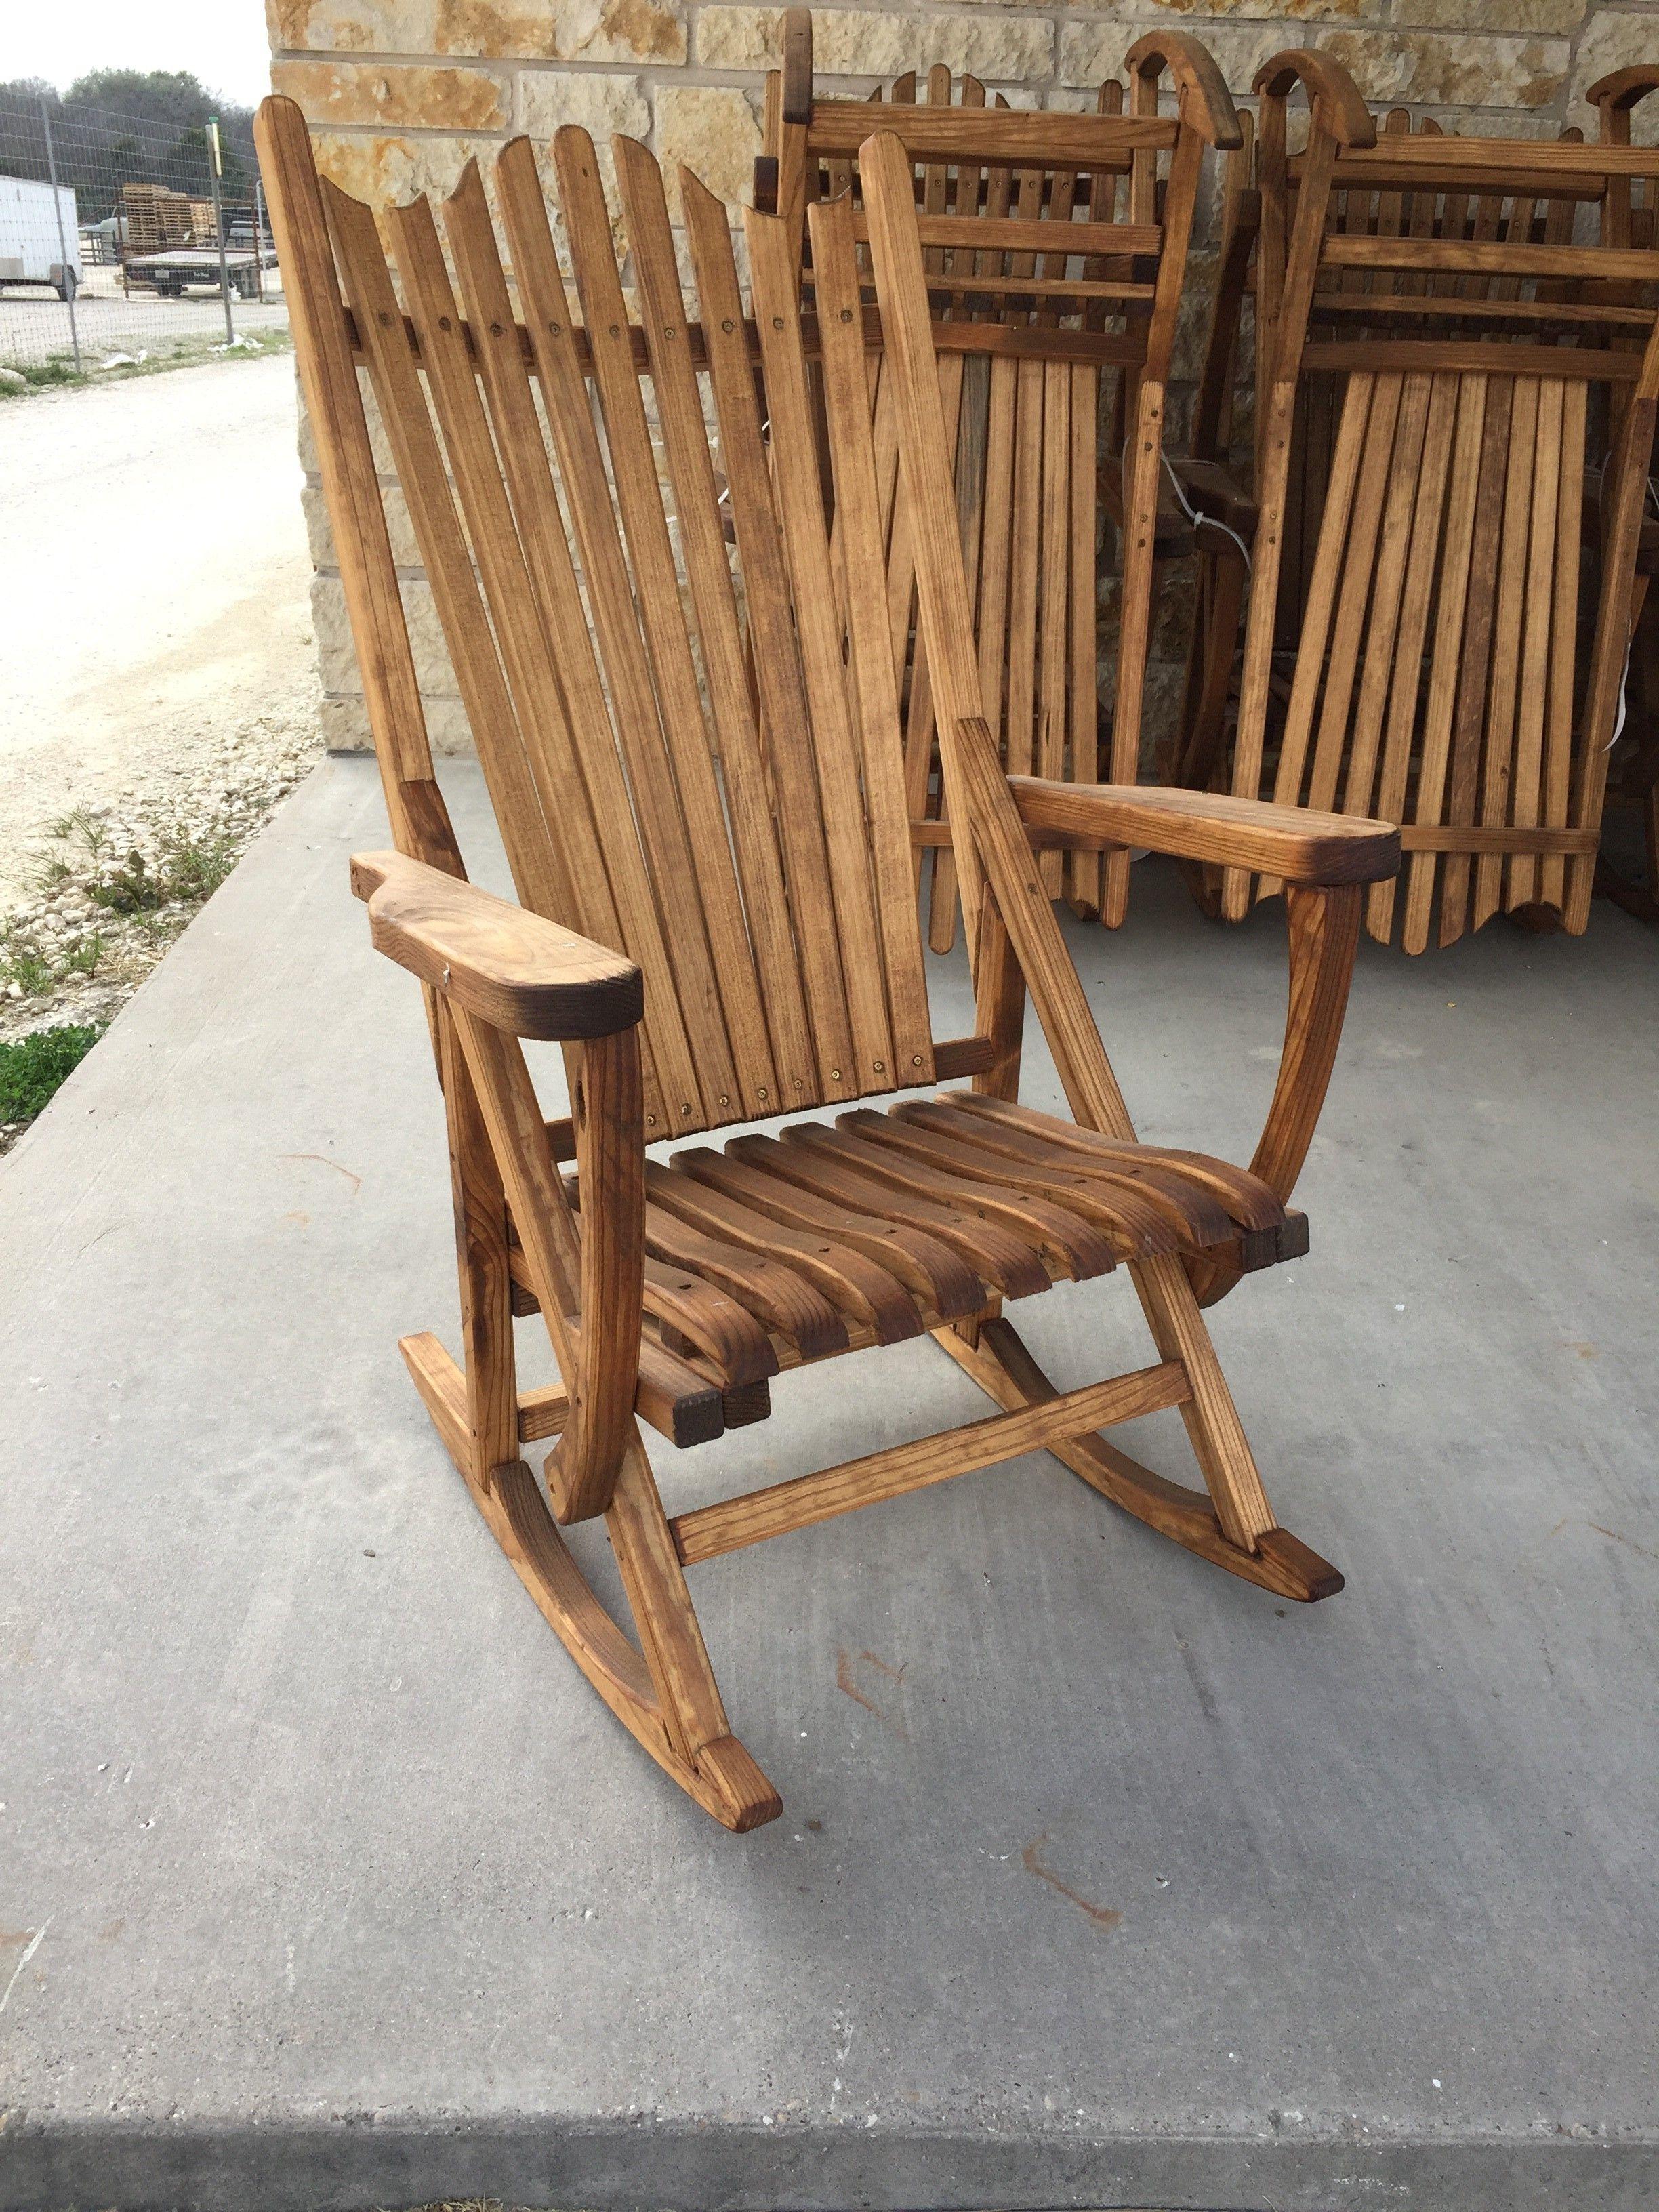 plum creek rocker 5 cedar house in 2019 porch chairs rocking rh pinterest com